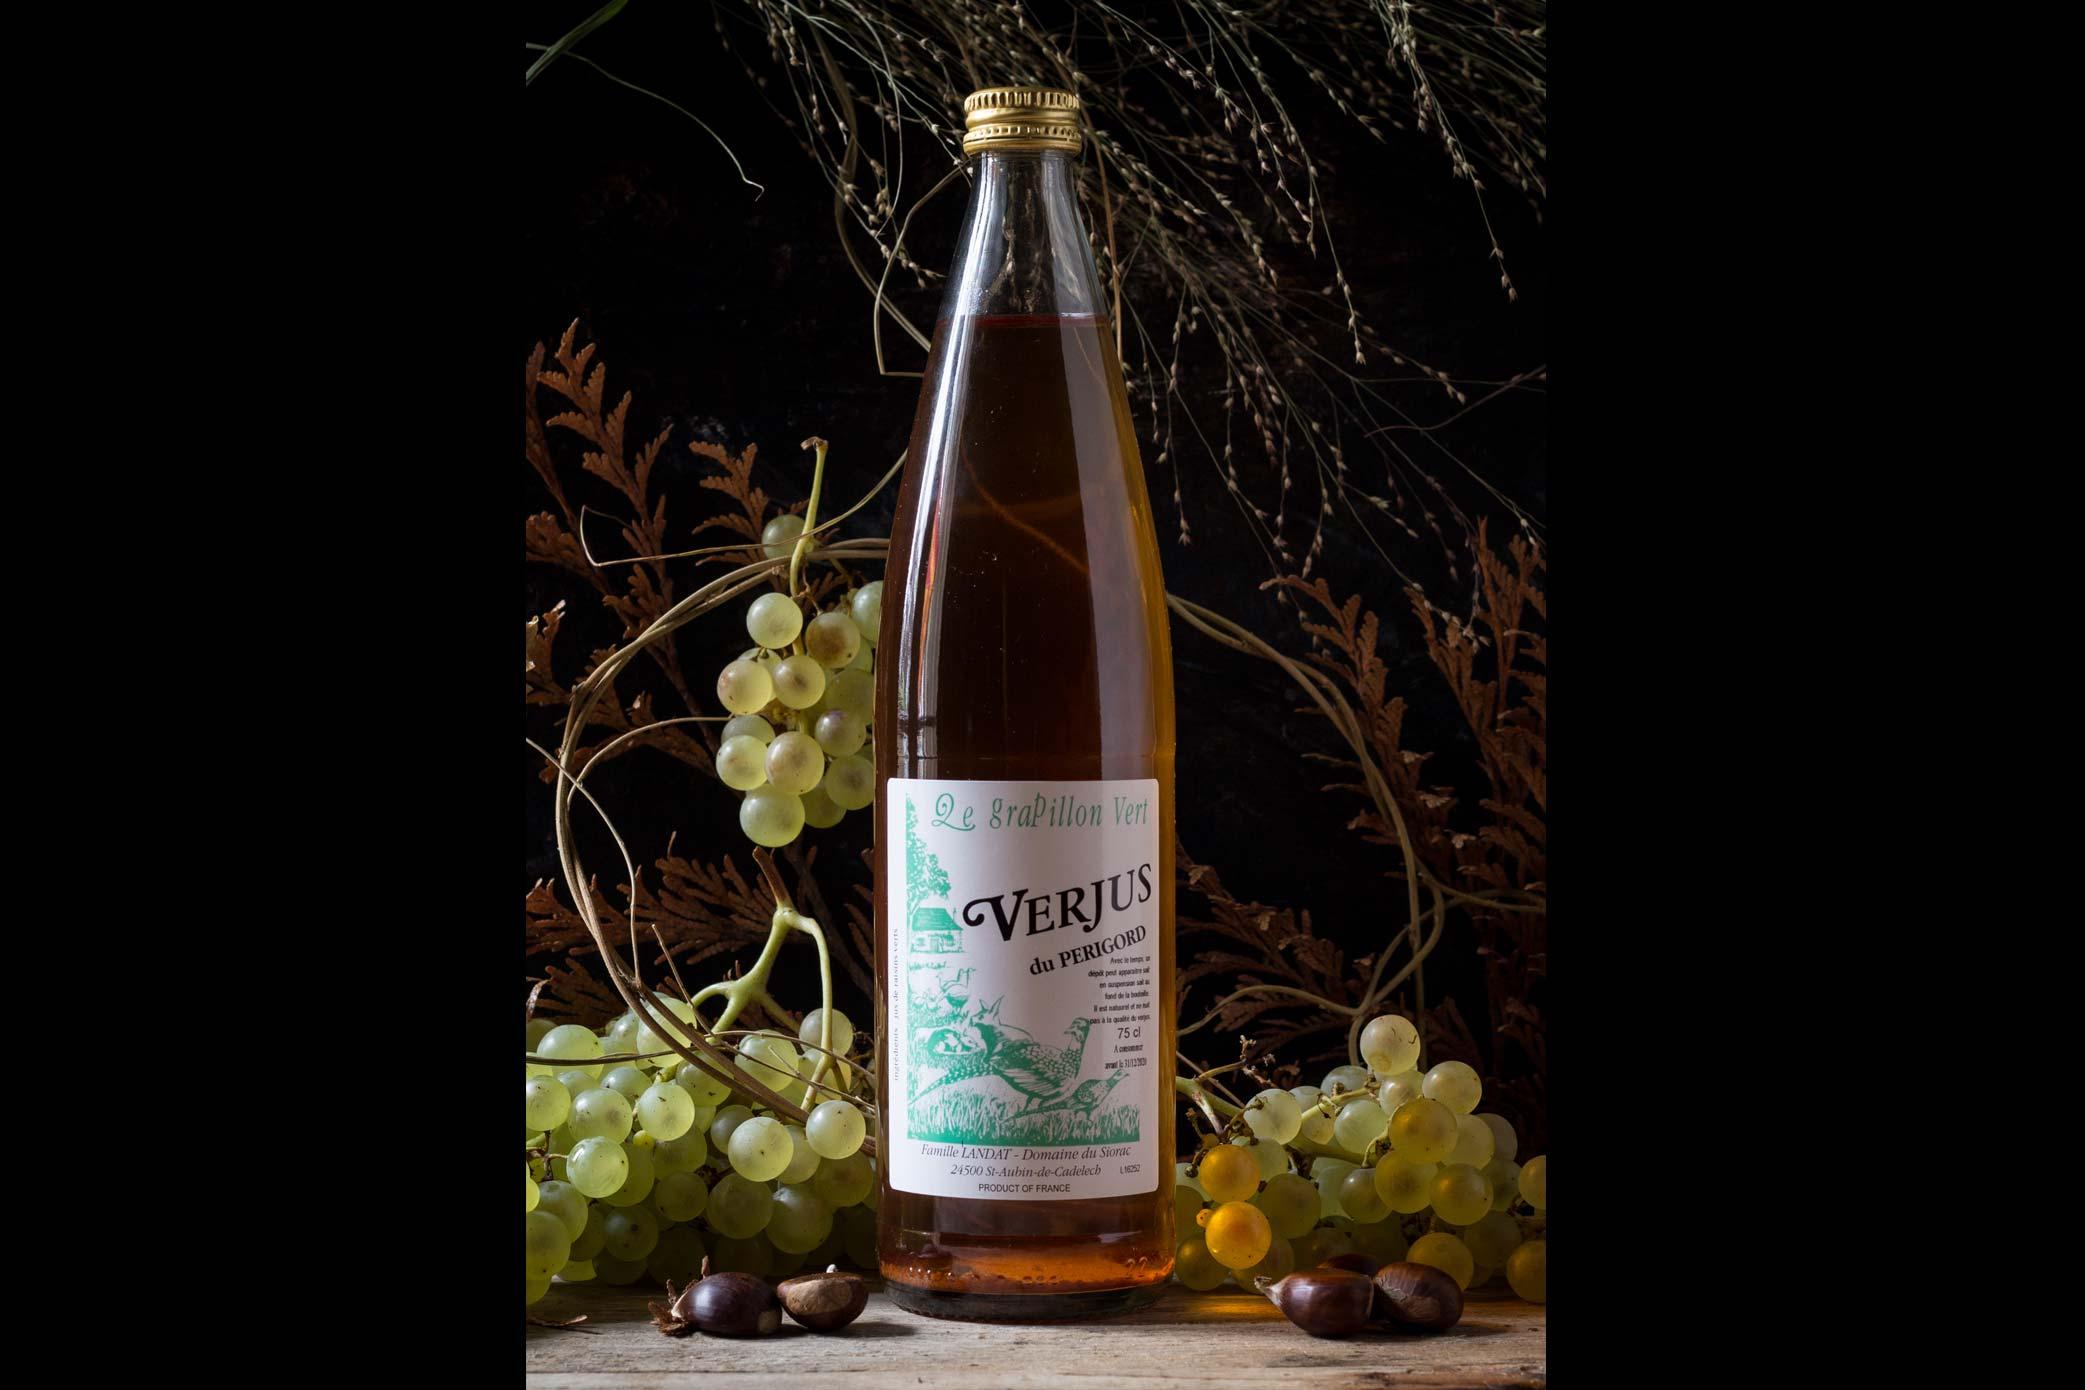 Verjus-4---Renards-Gourmets---Domaine-du-Siorac